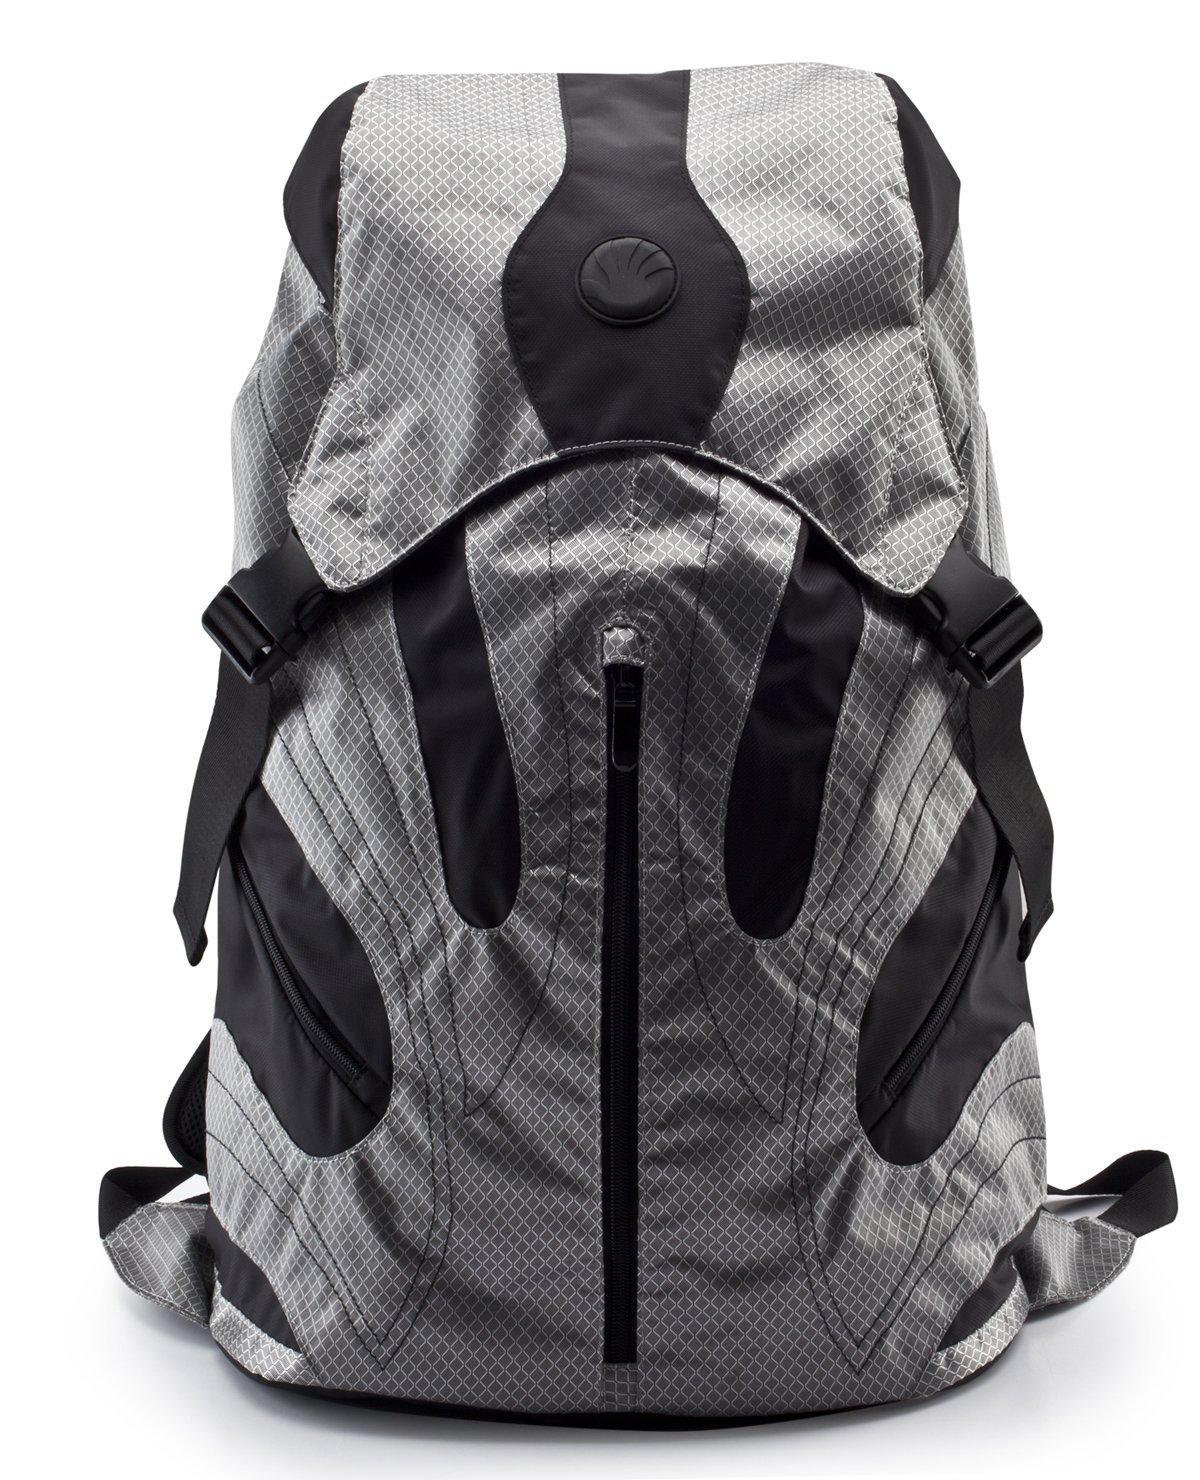 Slappa Kampus 18-Inch Backpack for Laptop Silver/Black (SL-BP-KAM1801) [並行輸入品] B078BPSCB8